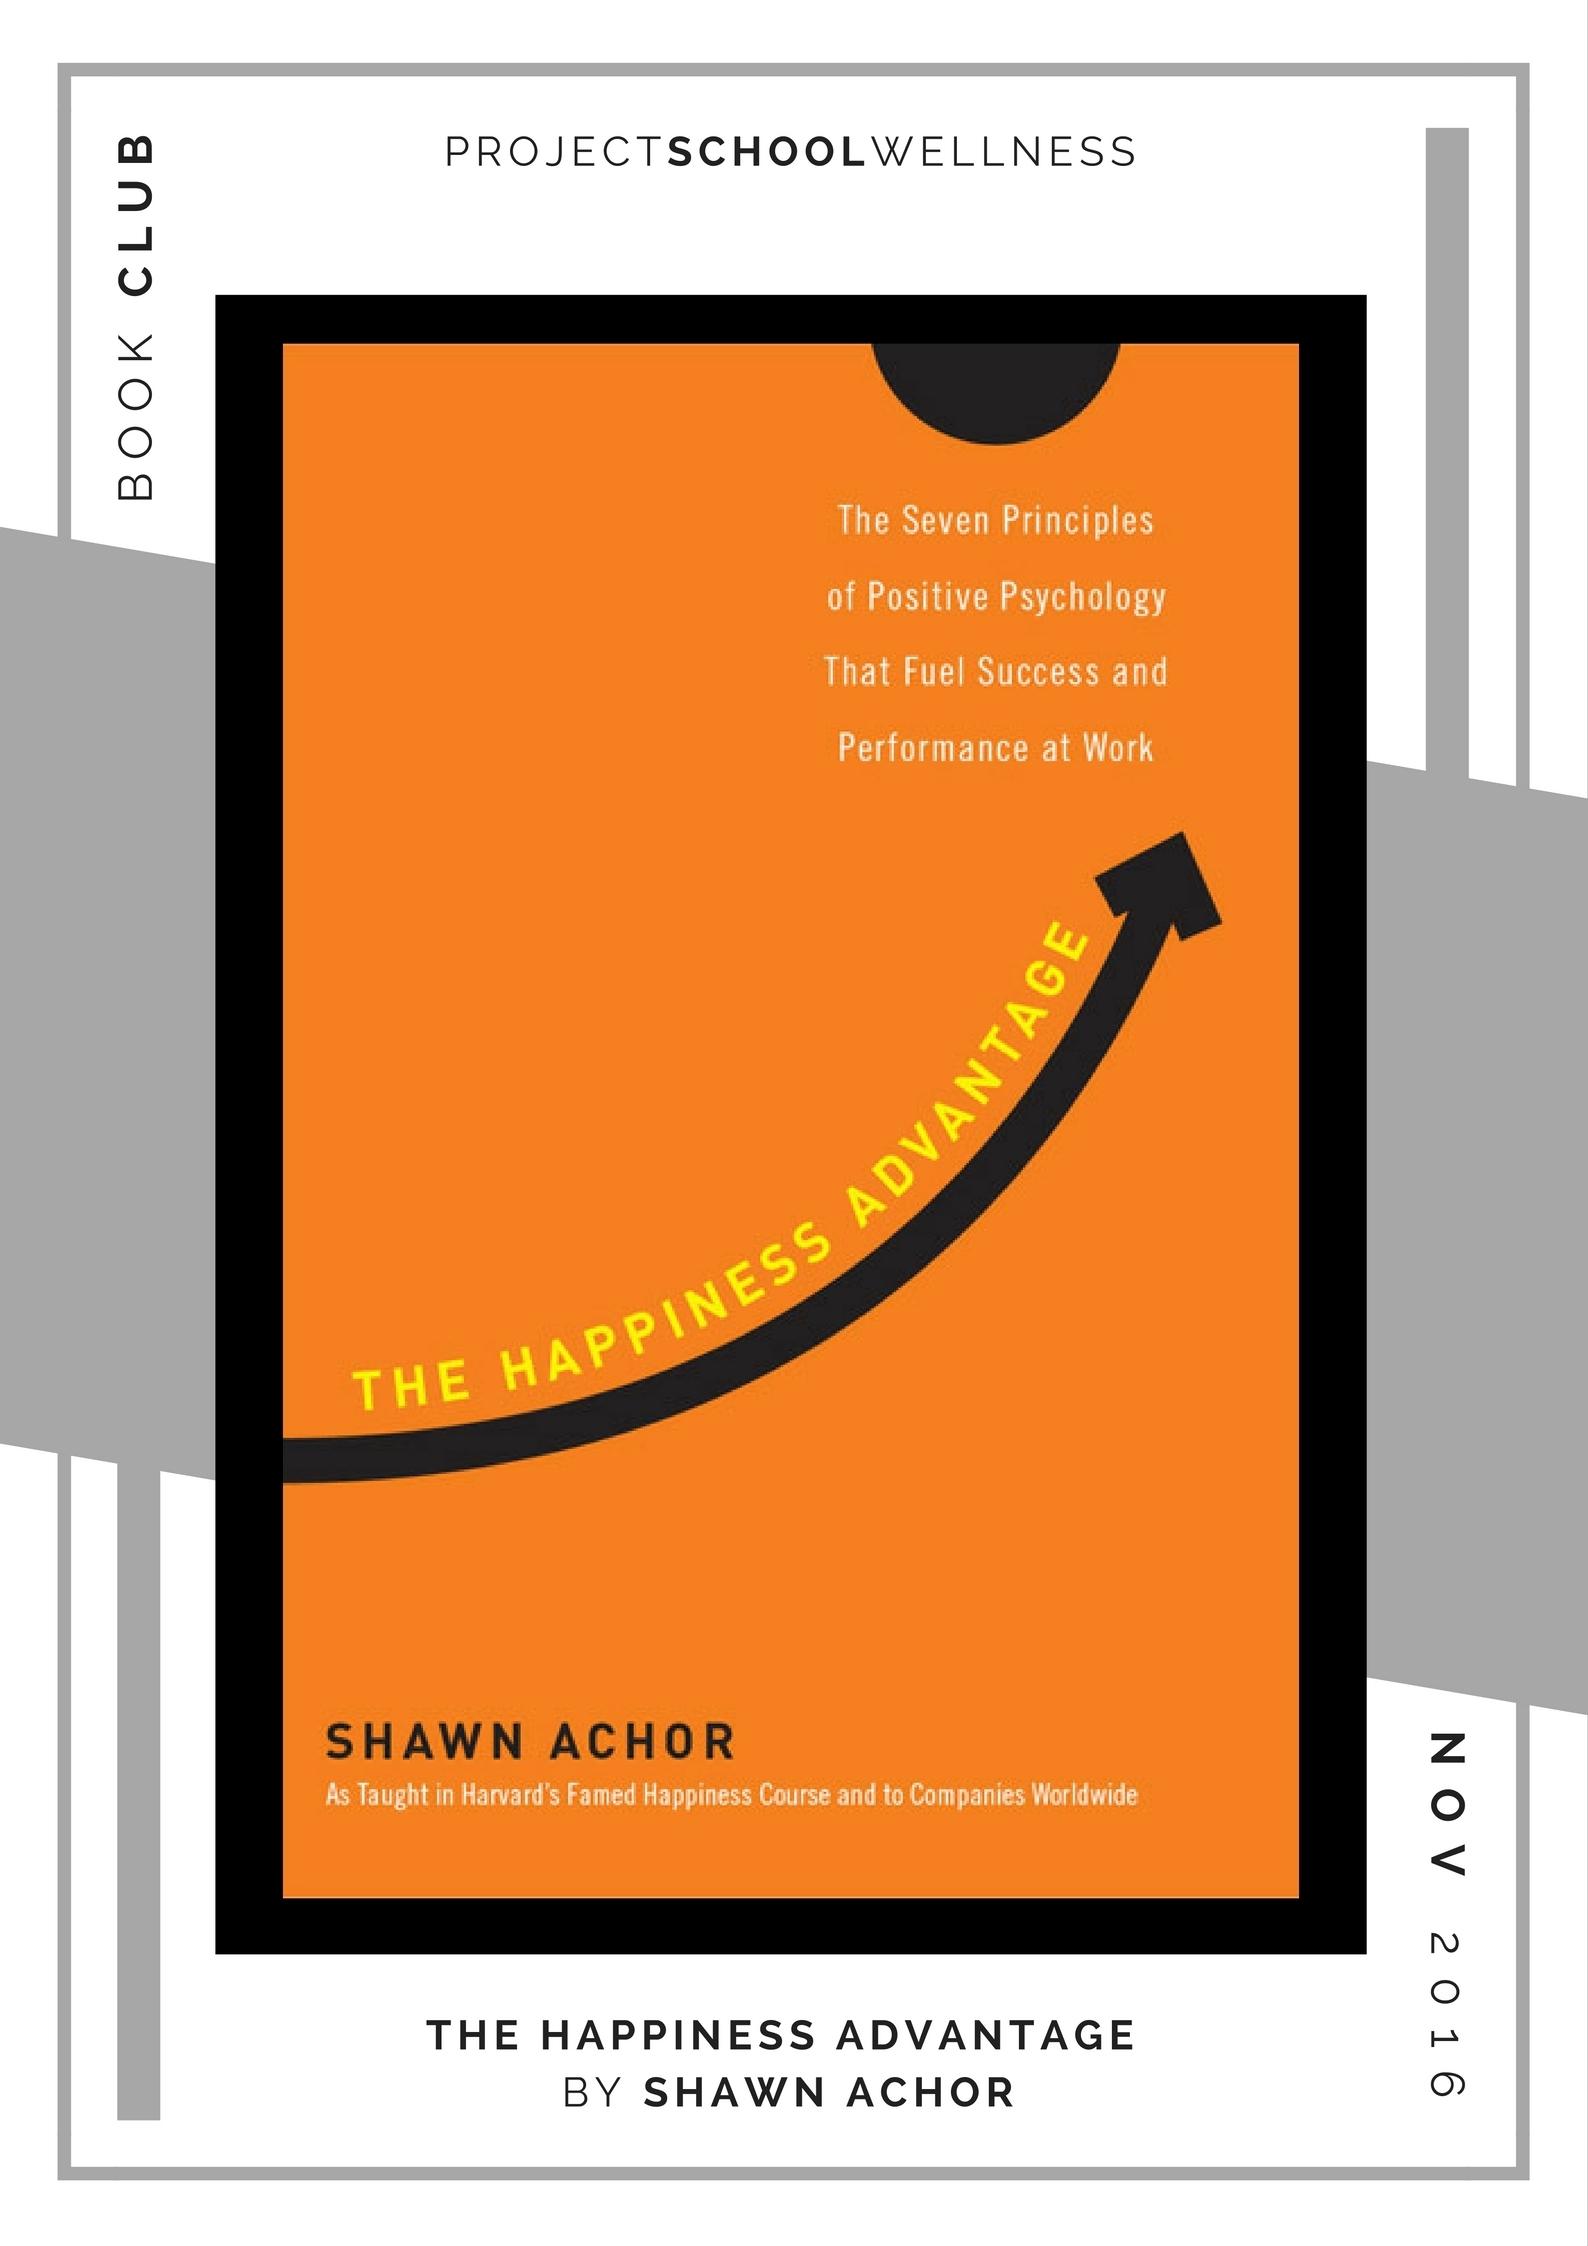 Shawn Achor, The Happiness Advantage - Project School Wellness' Teacher Book Club, must read books for every teacher!